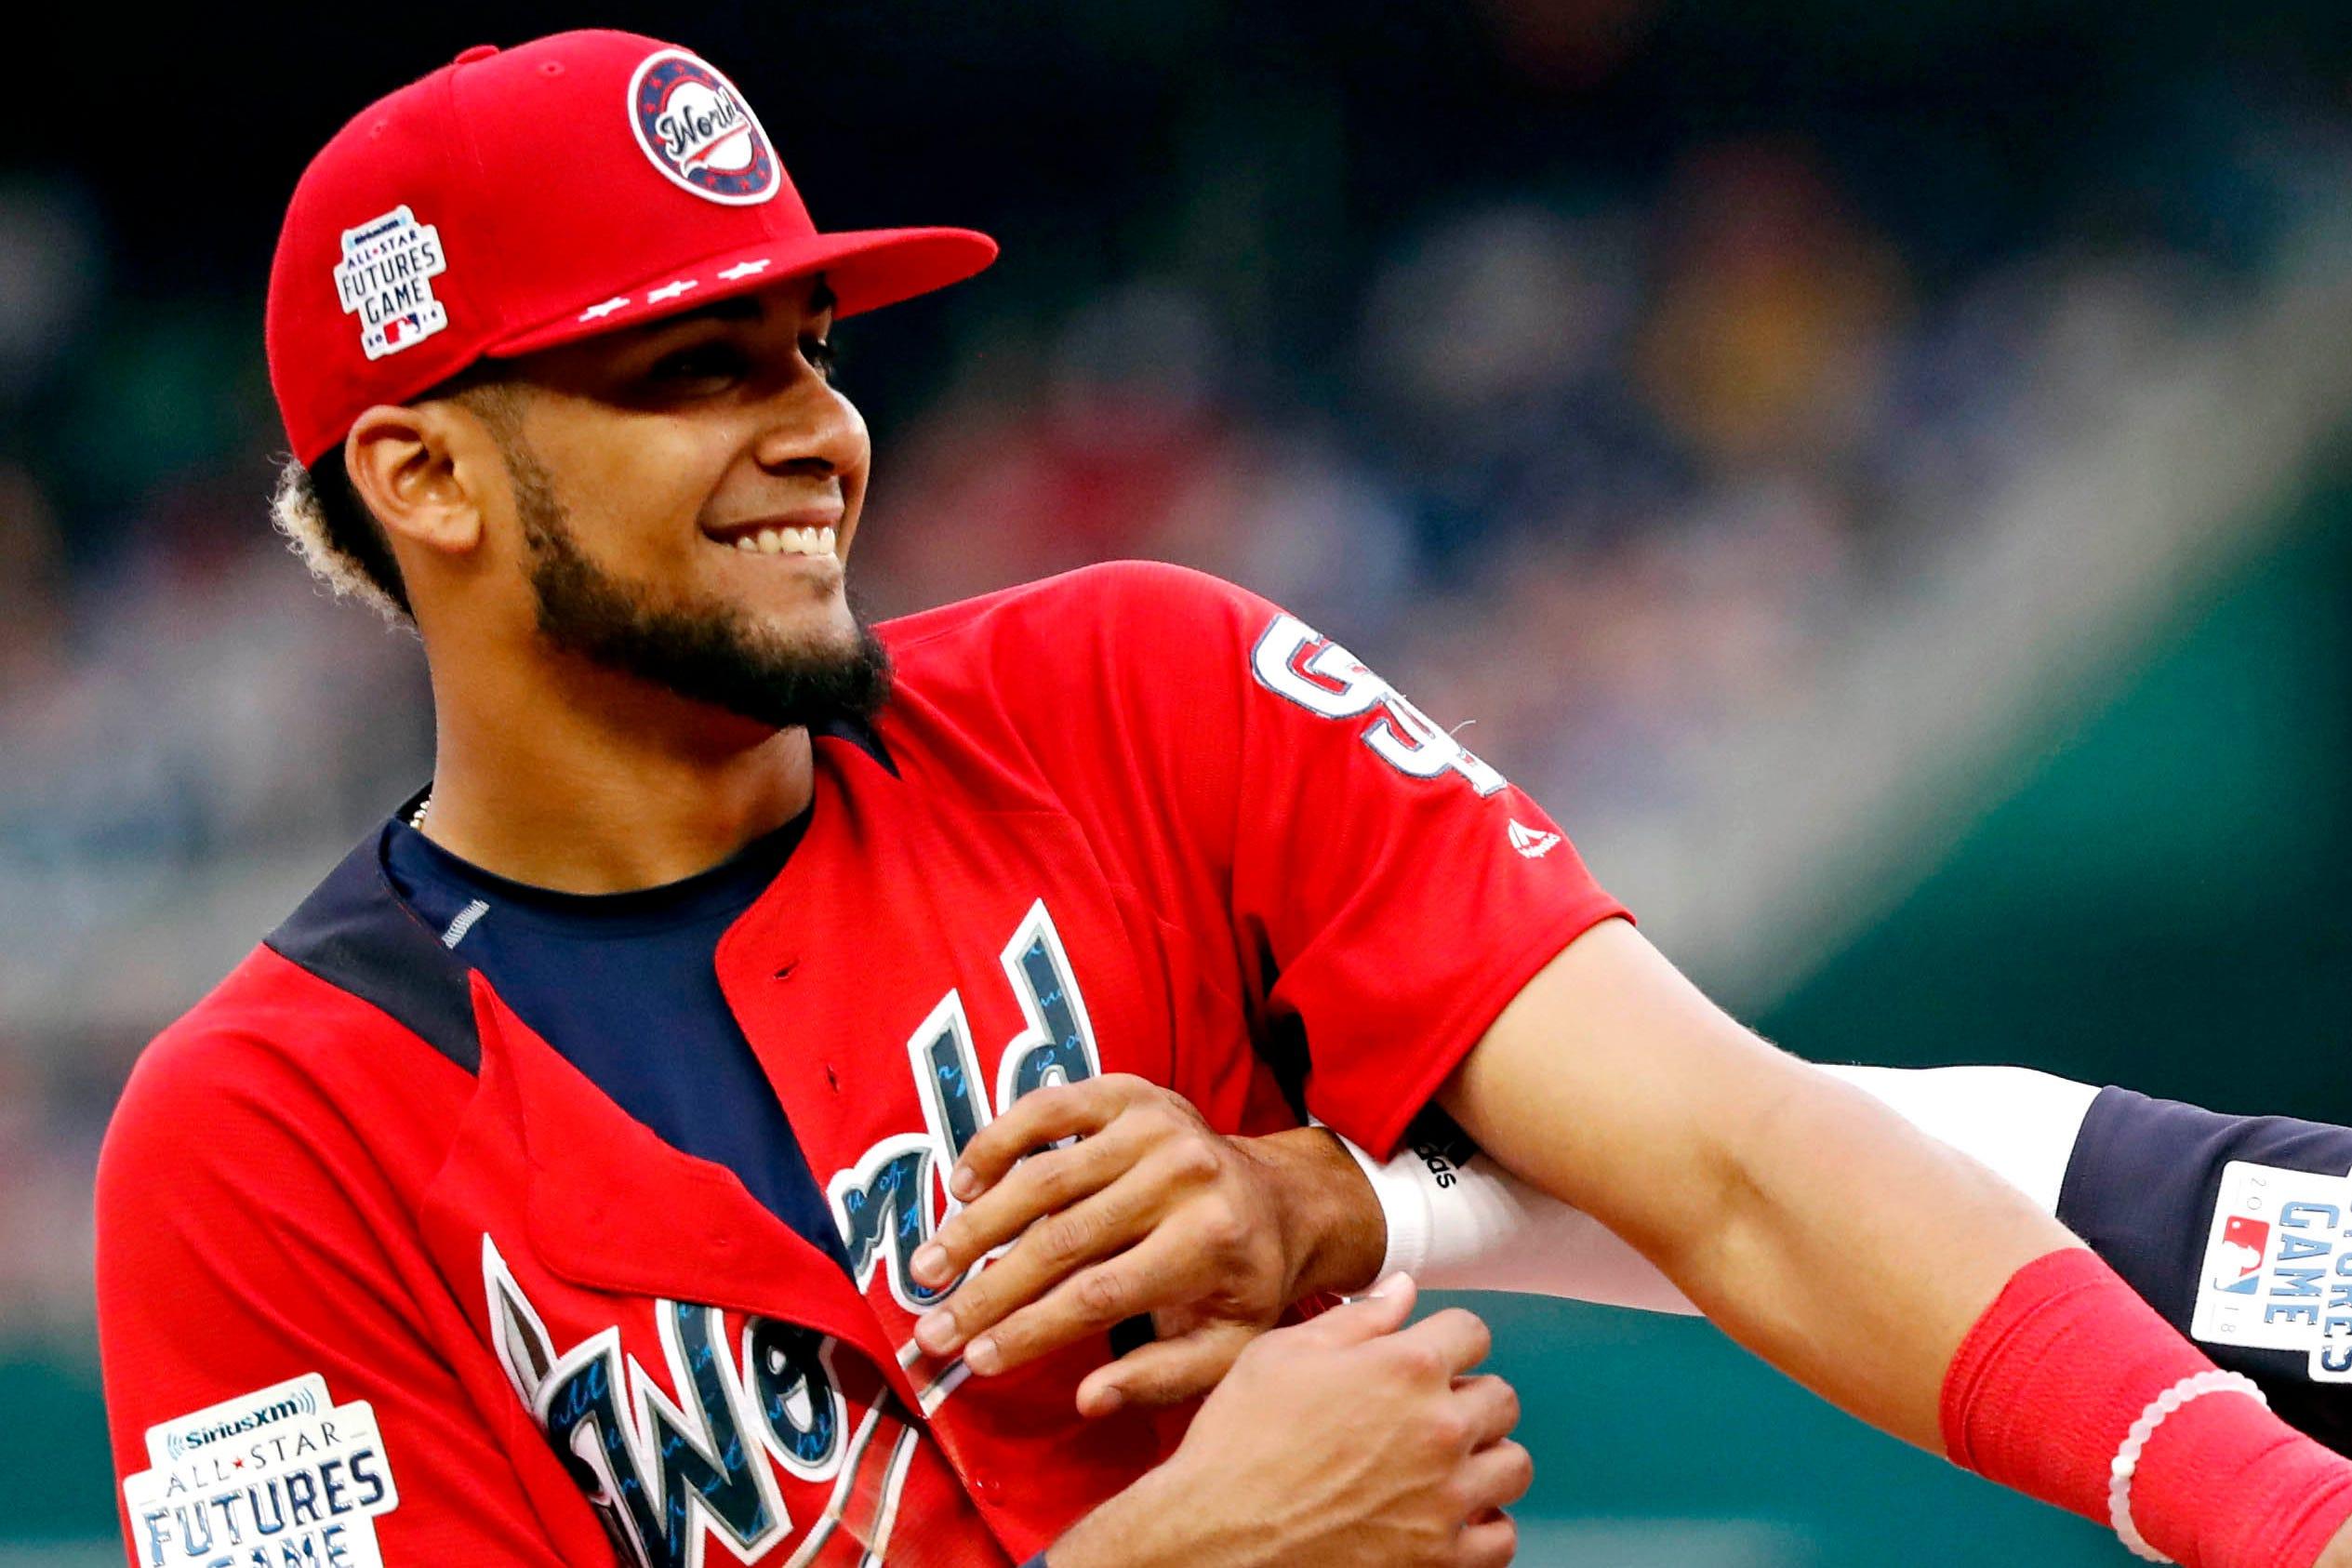 Fernando Tatis Jr. is the son of an 11-year MLB veteran.